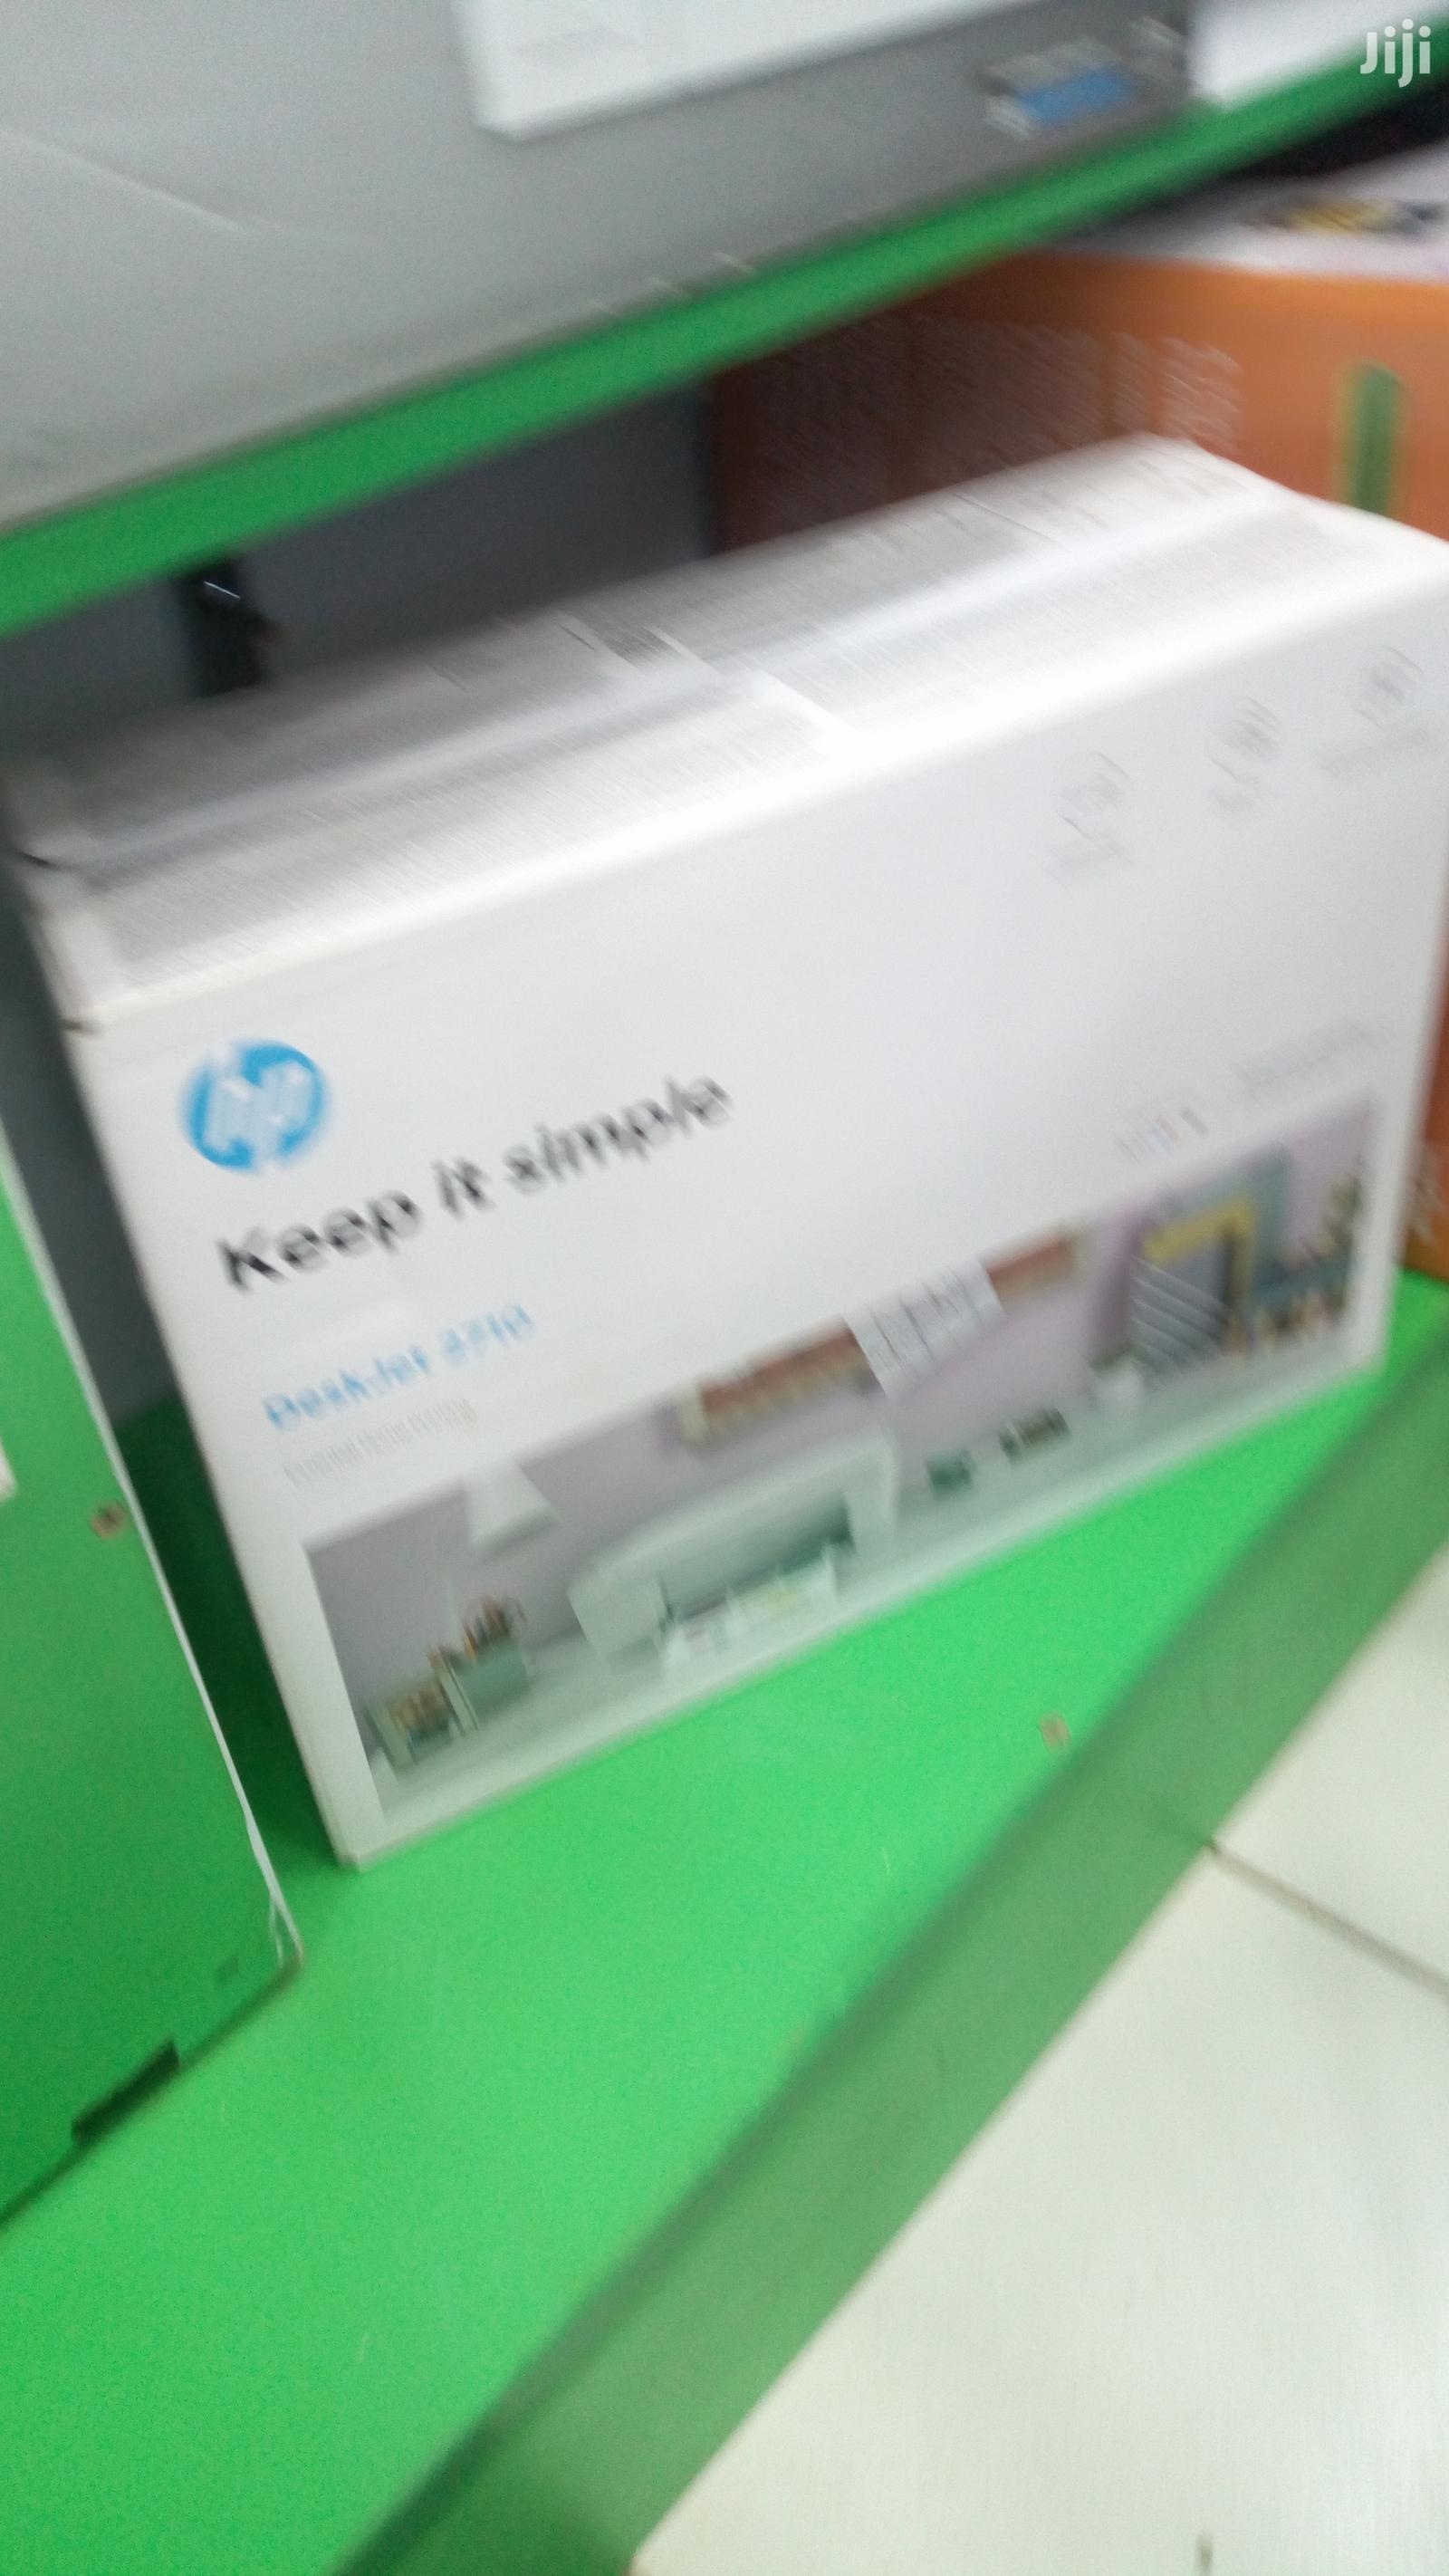 All in One HP Deskjet 2710 Wireless Printer | Printers & Scanners for sale in Kampala, Central Region, Uganda